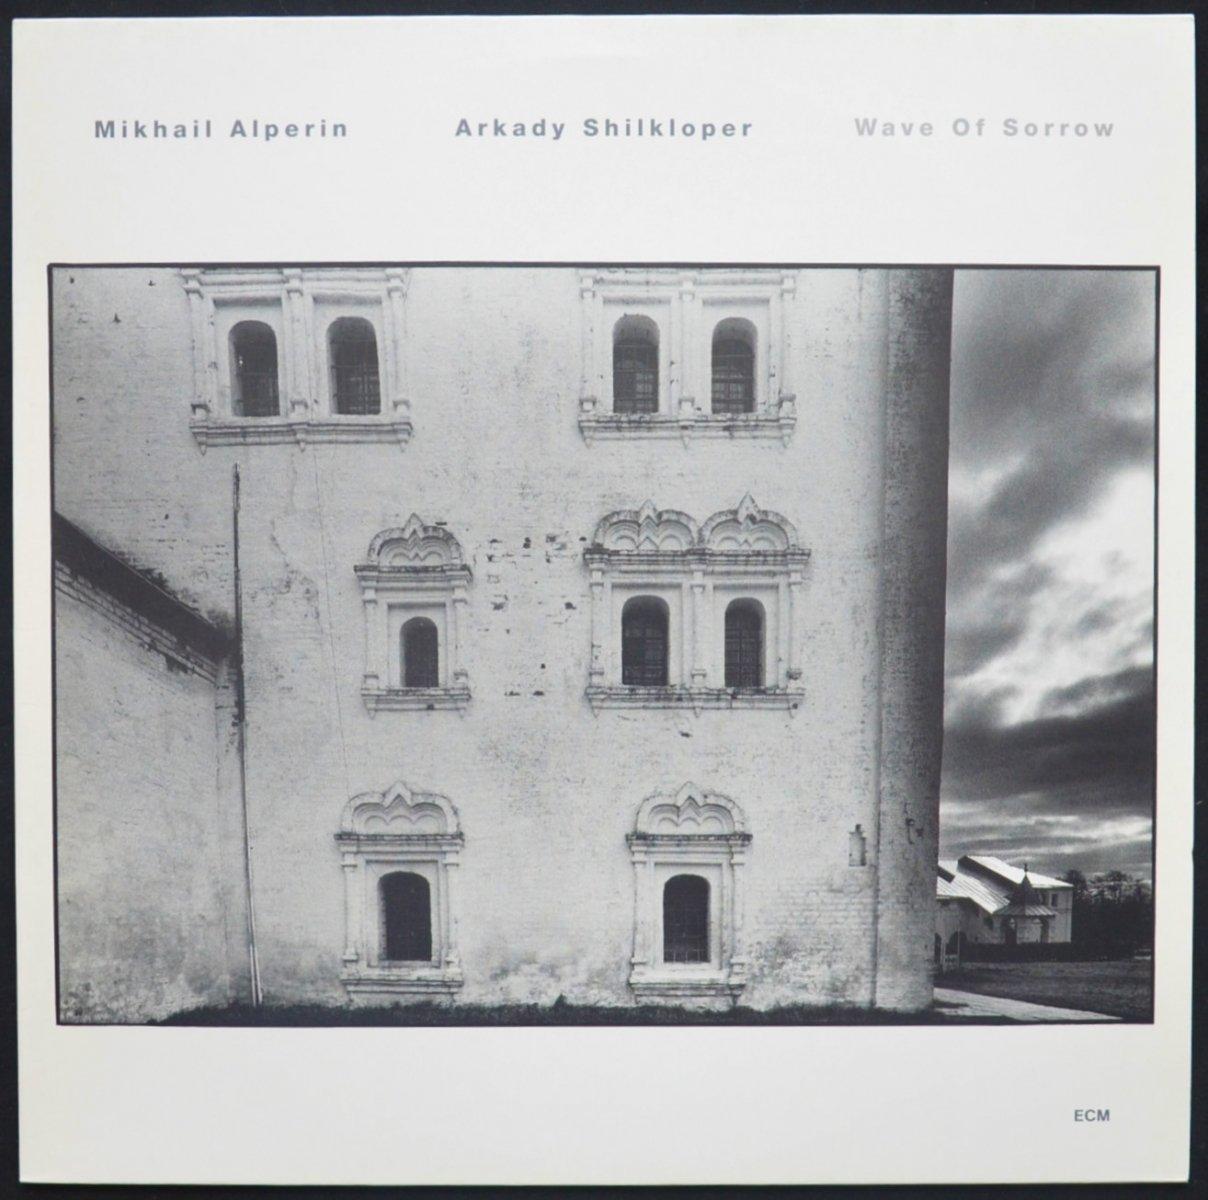 MIKHAIL ALPERIN / ARKADY SHILKLOPER / WAVE OF SORROW (LP)